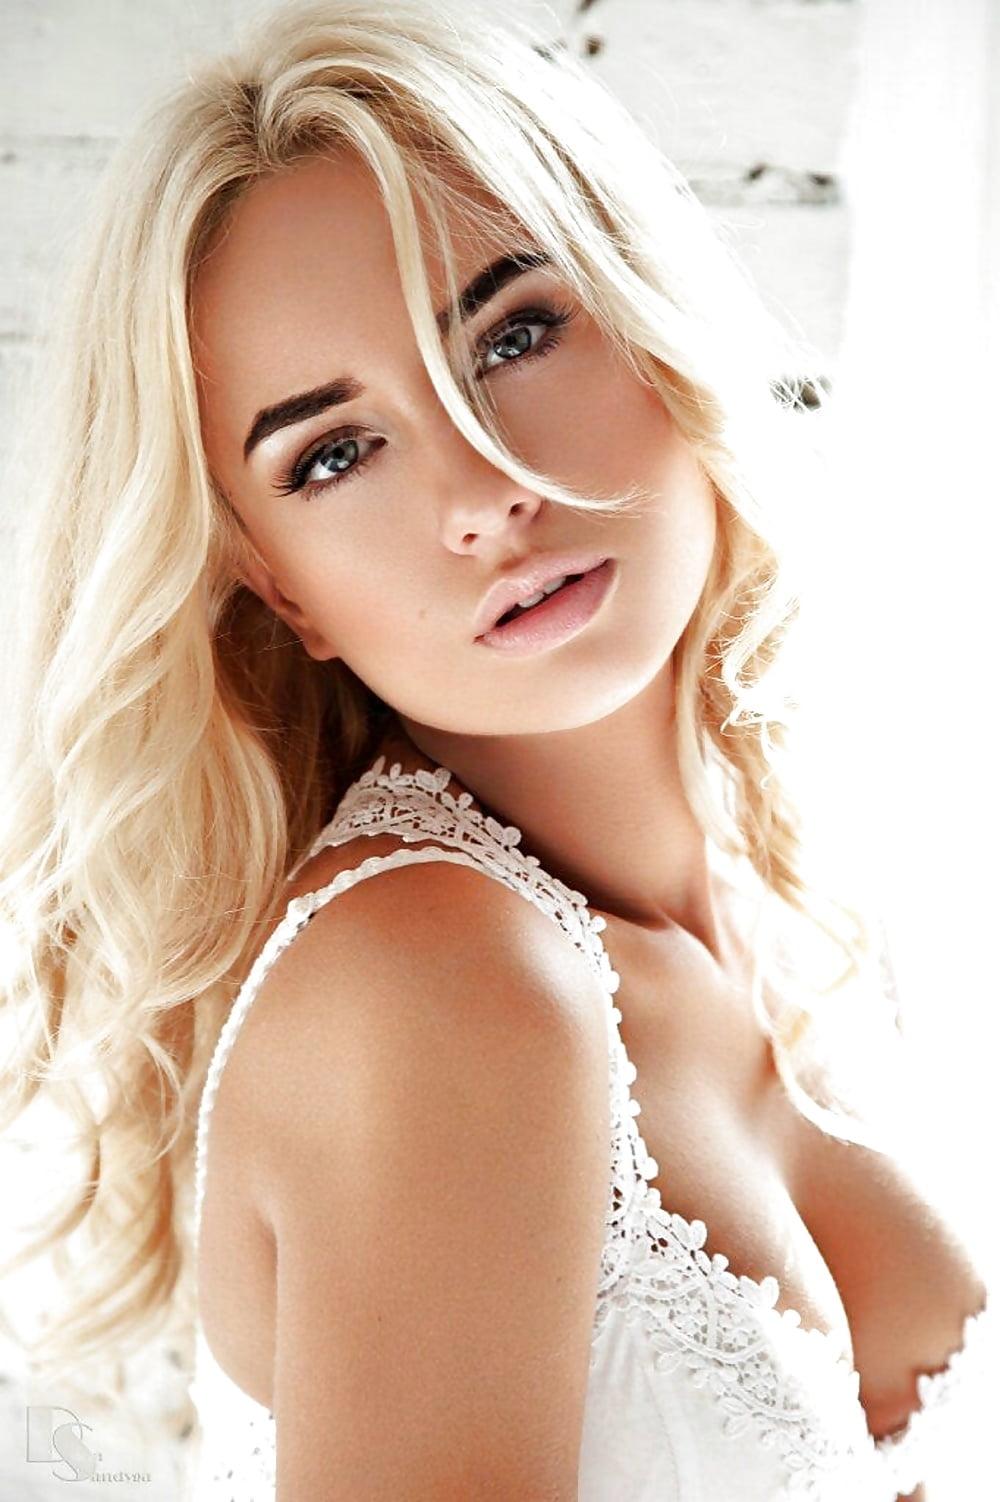 Women denmark sexiest women girls